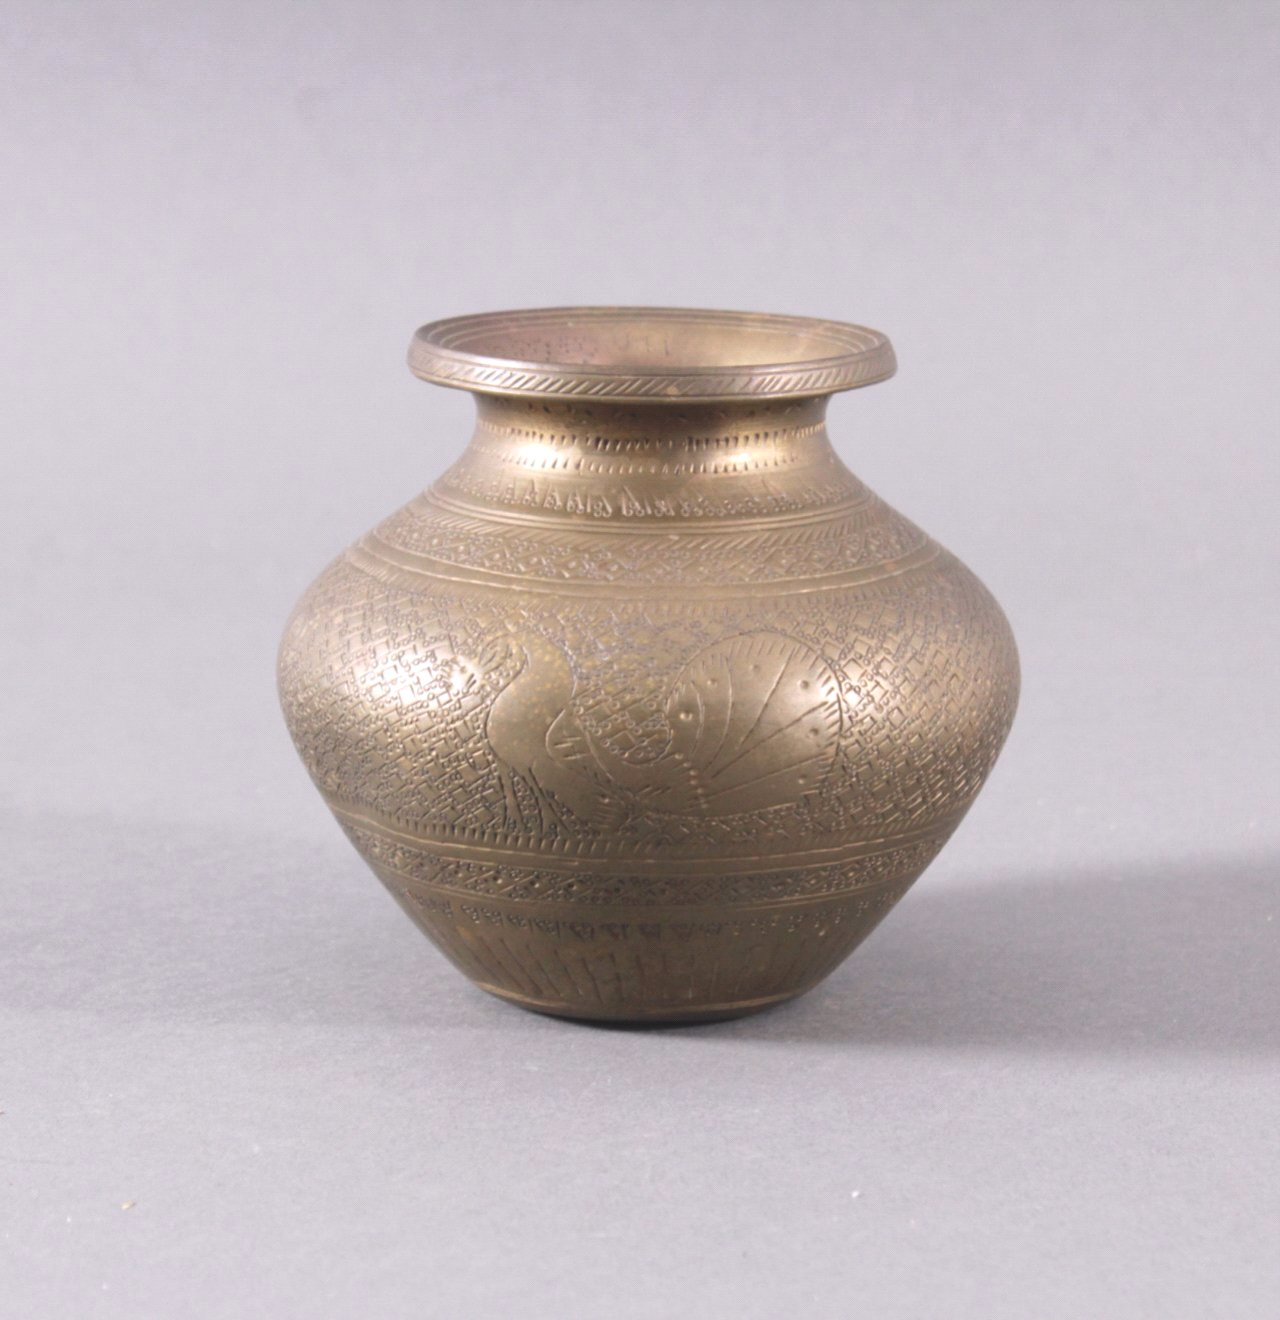 Antikes Bronzegefäß, wohl China